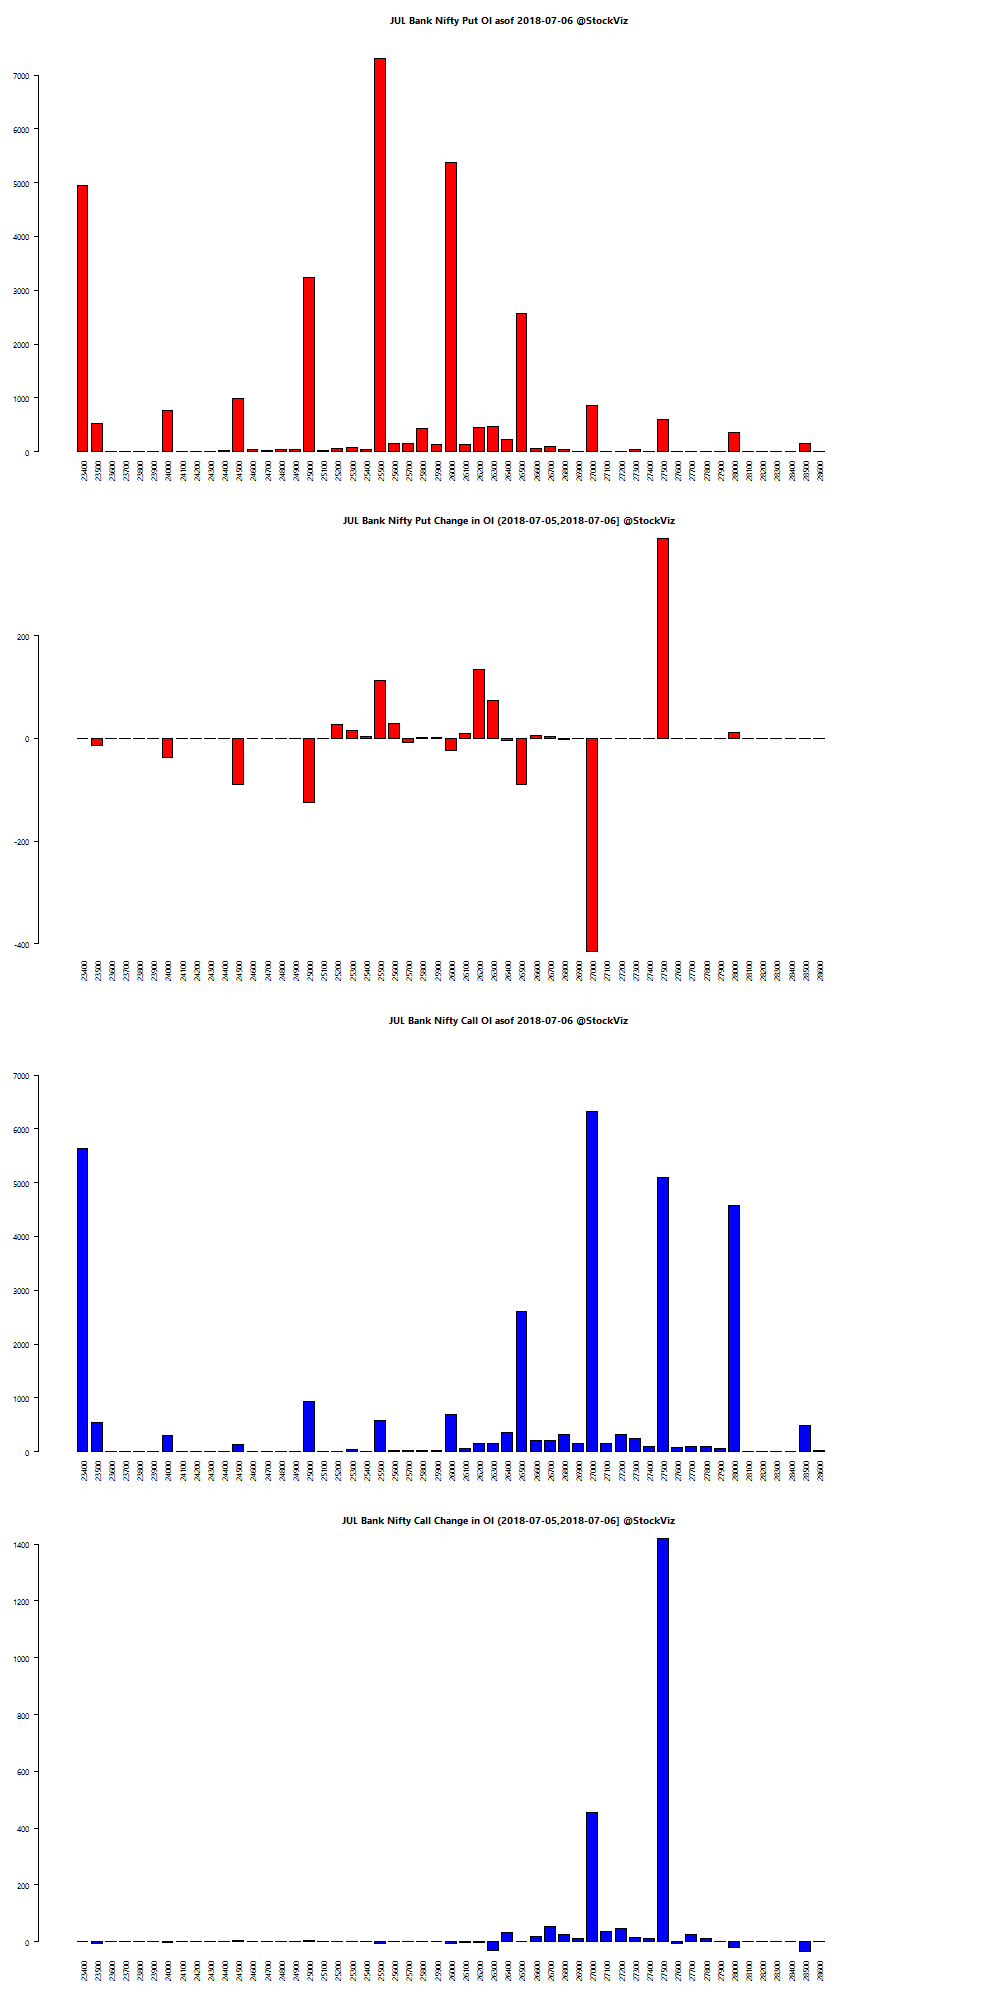 JUL BANKNIFTY OI chart